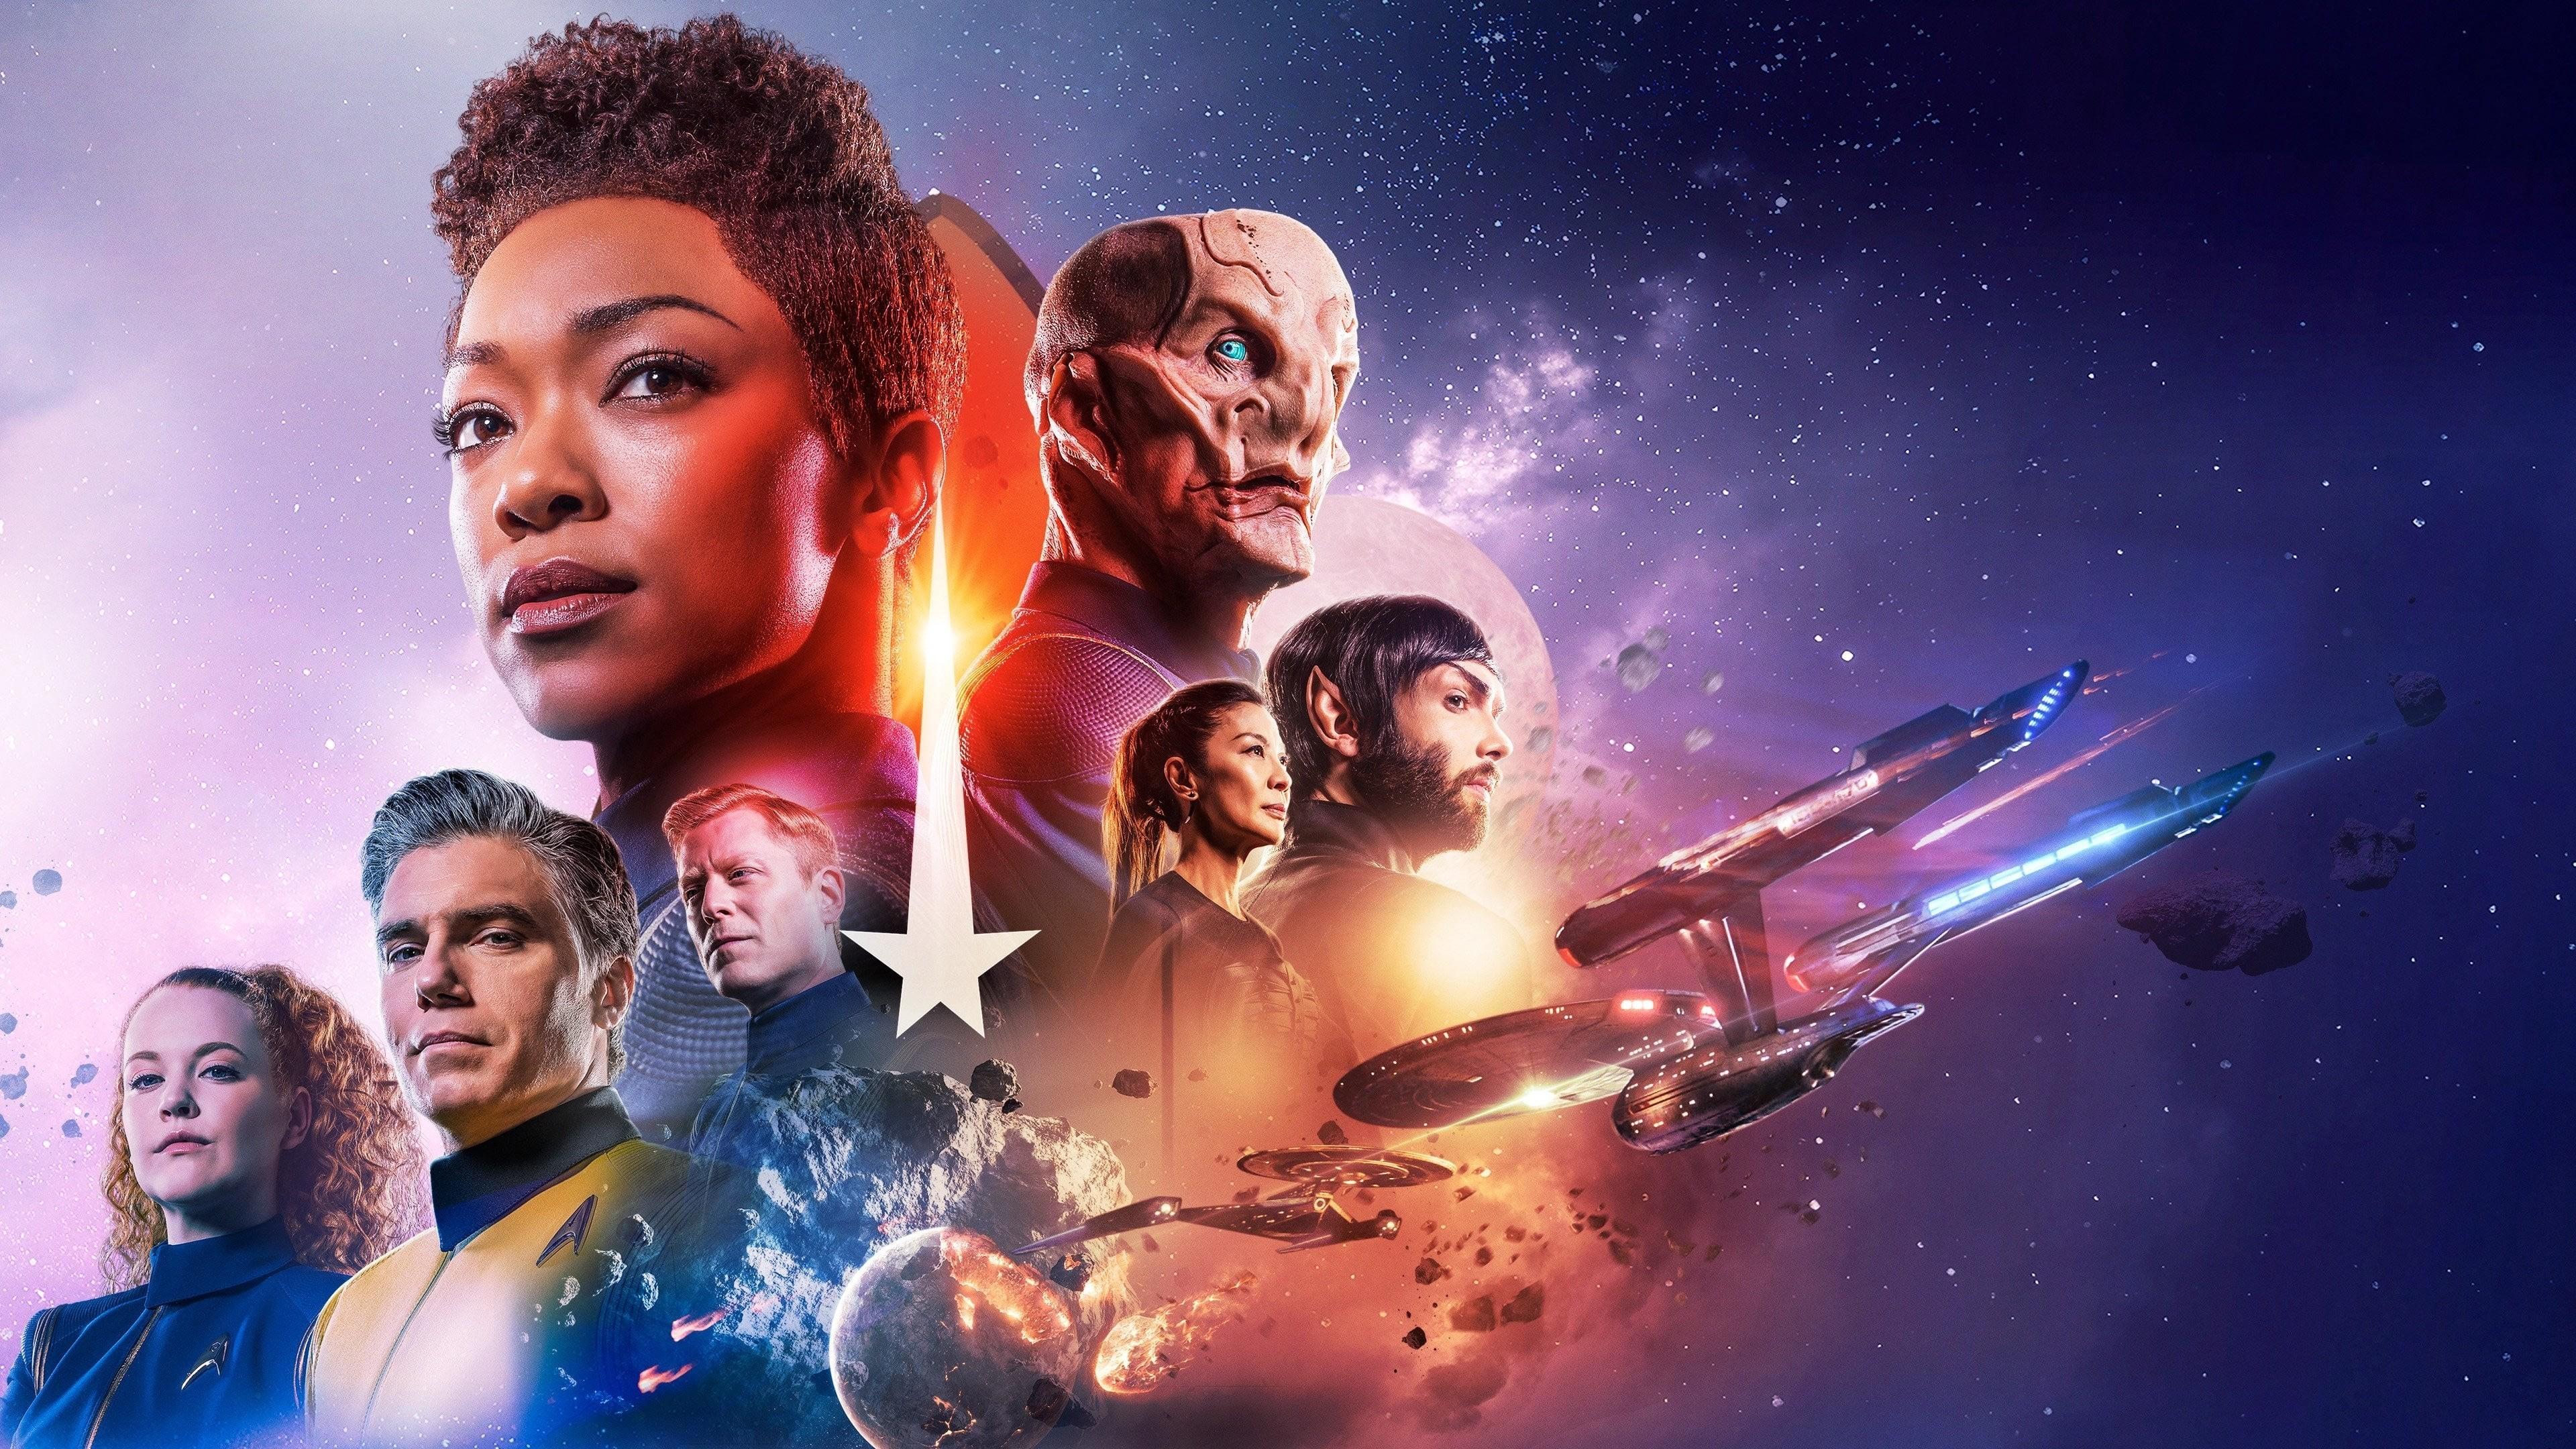 star trek discovery season 2 4k 1615201331 - Star Trek Discovery Season 2 4k - Star Trek Discovery Season 2 4k wallpapers